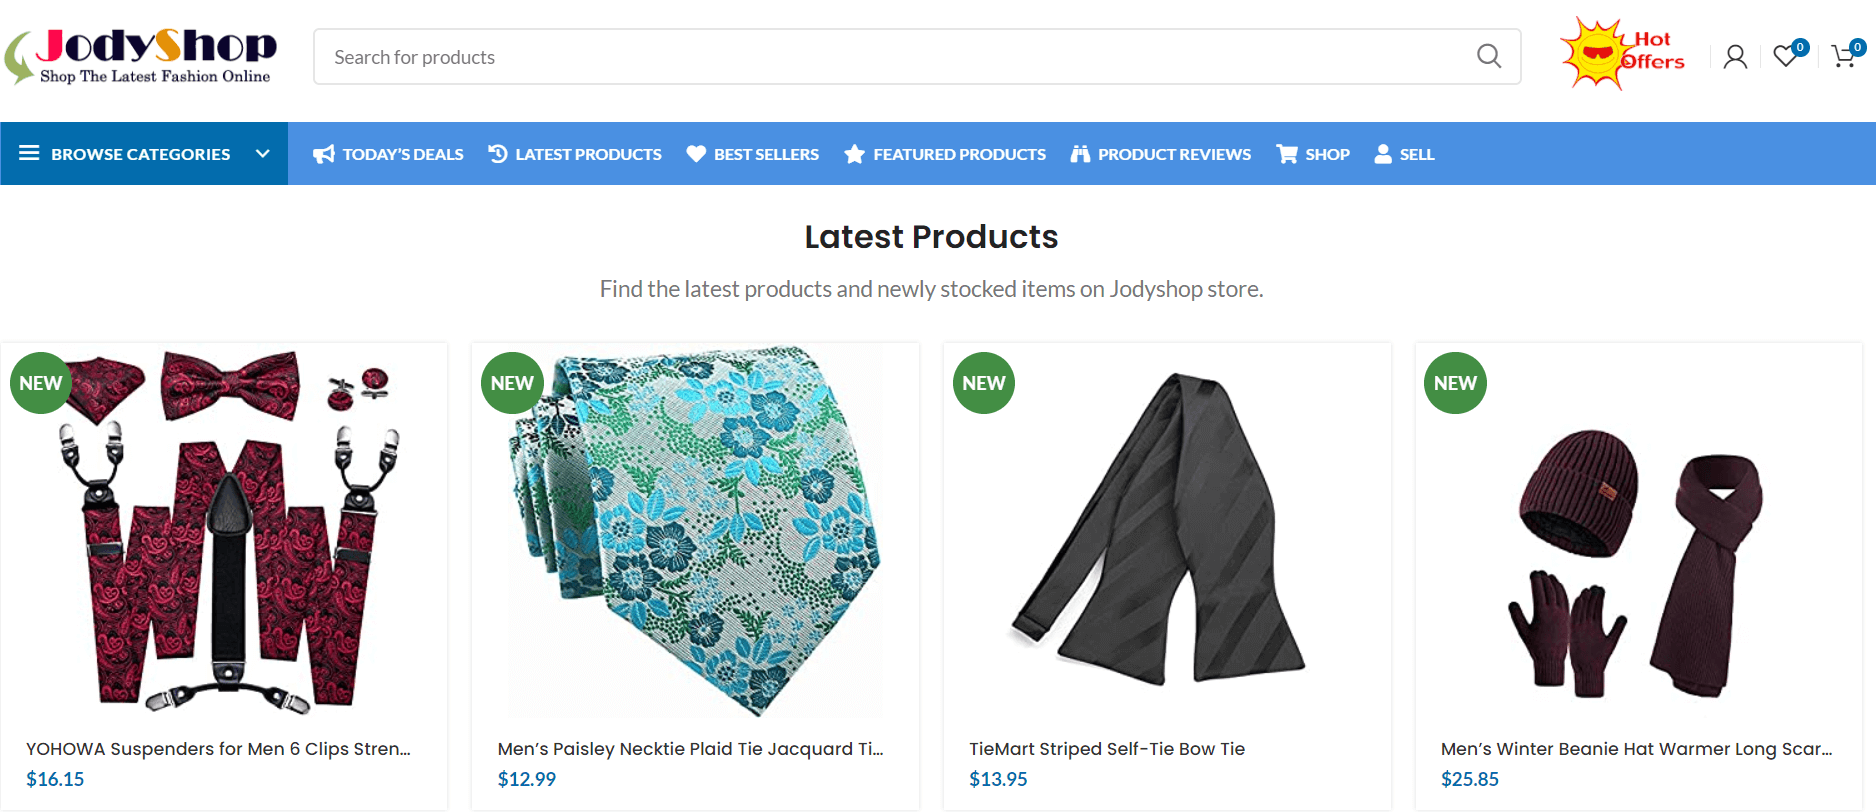 jodyshop-latest-products